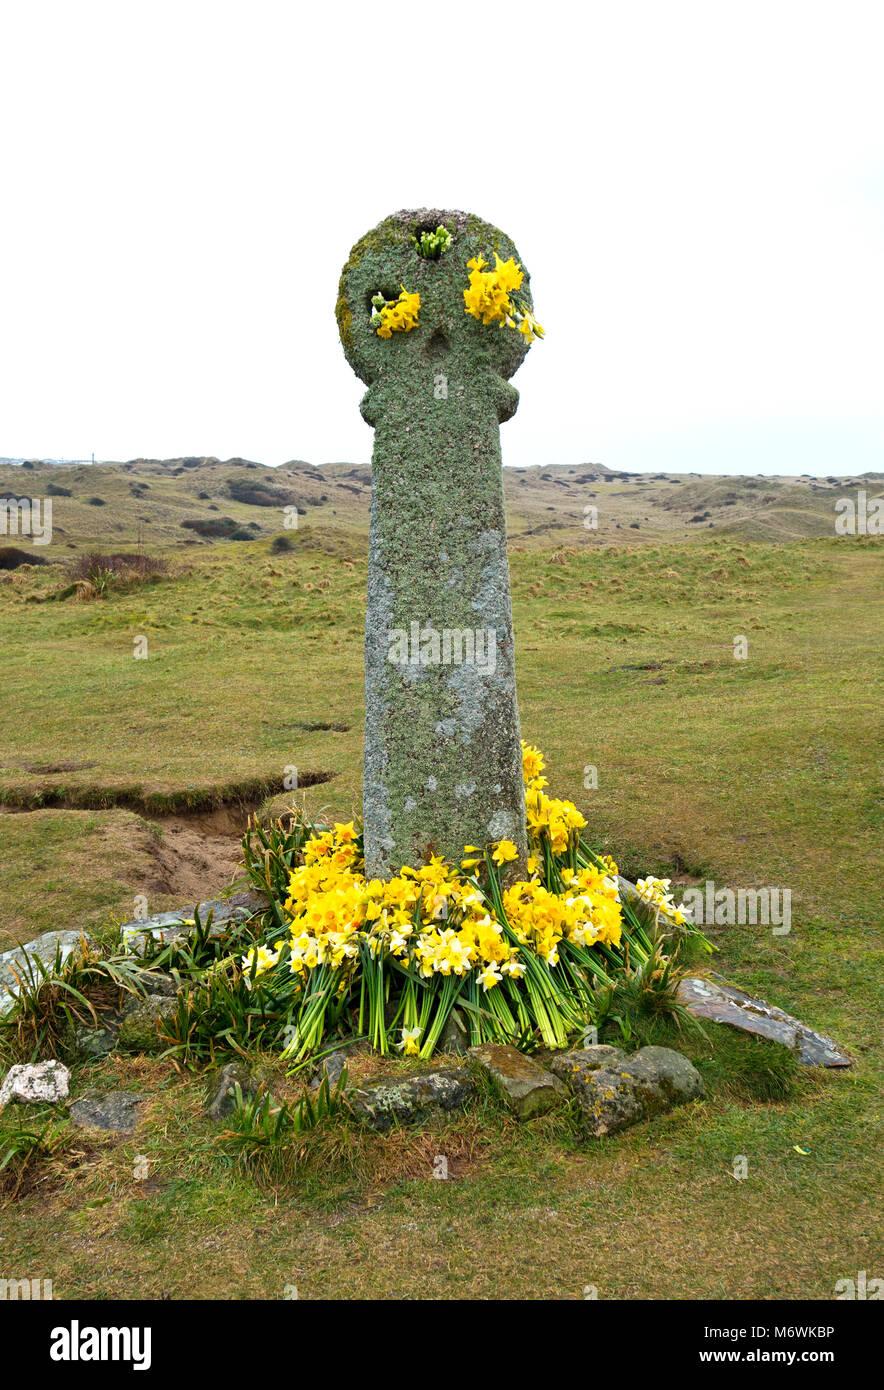 10th century stone cross dedicated to st.piran the patron saint of tin miners in cornwall, england, uk. - Stock Image